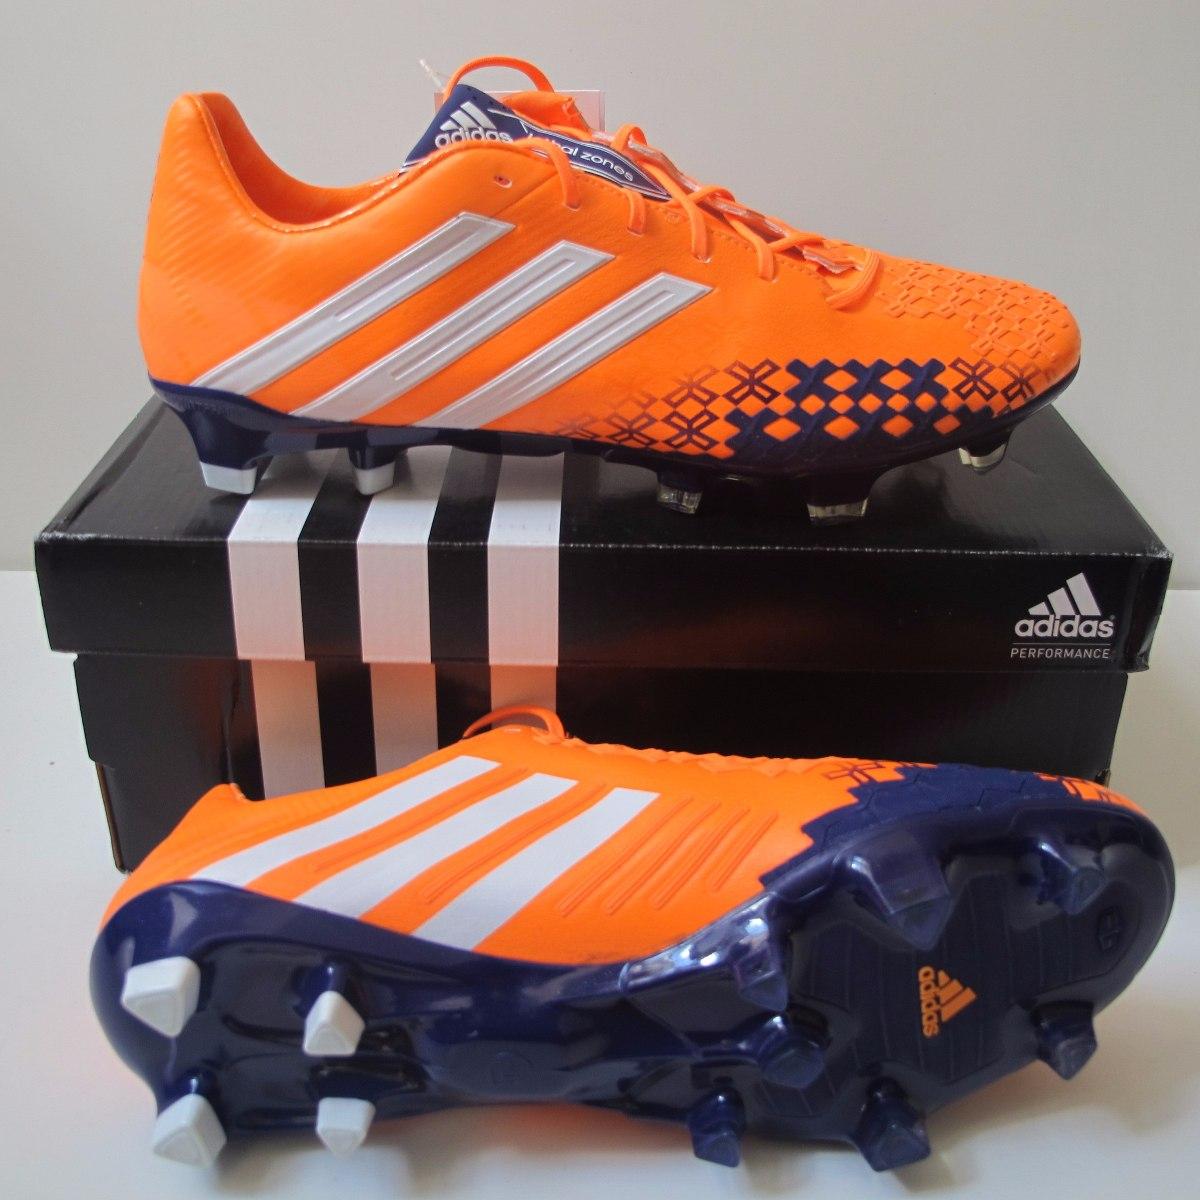 9700d7681d ... chuteira adidas predator lz fg pro produto europeu original. Carregando  zoom. exclusive shoes 1eb04  Chuteira de Campo ...